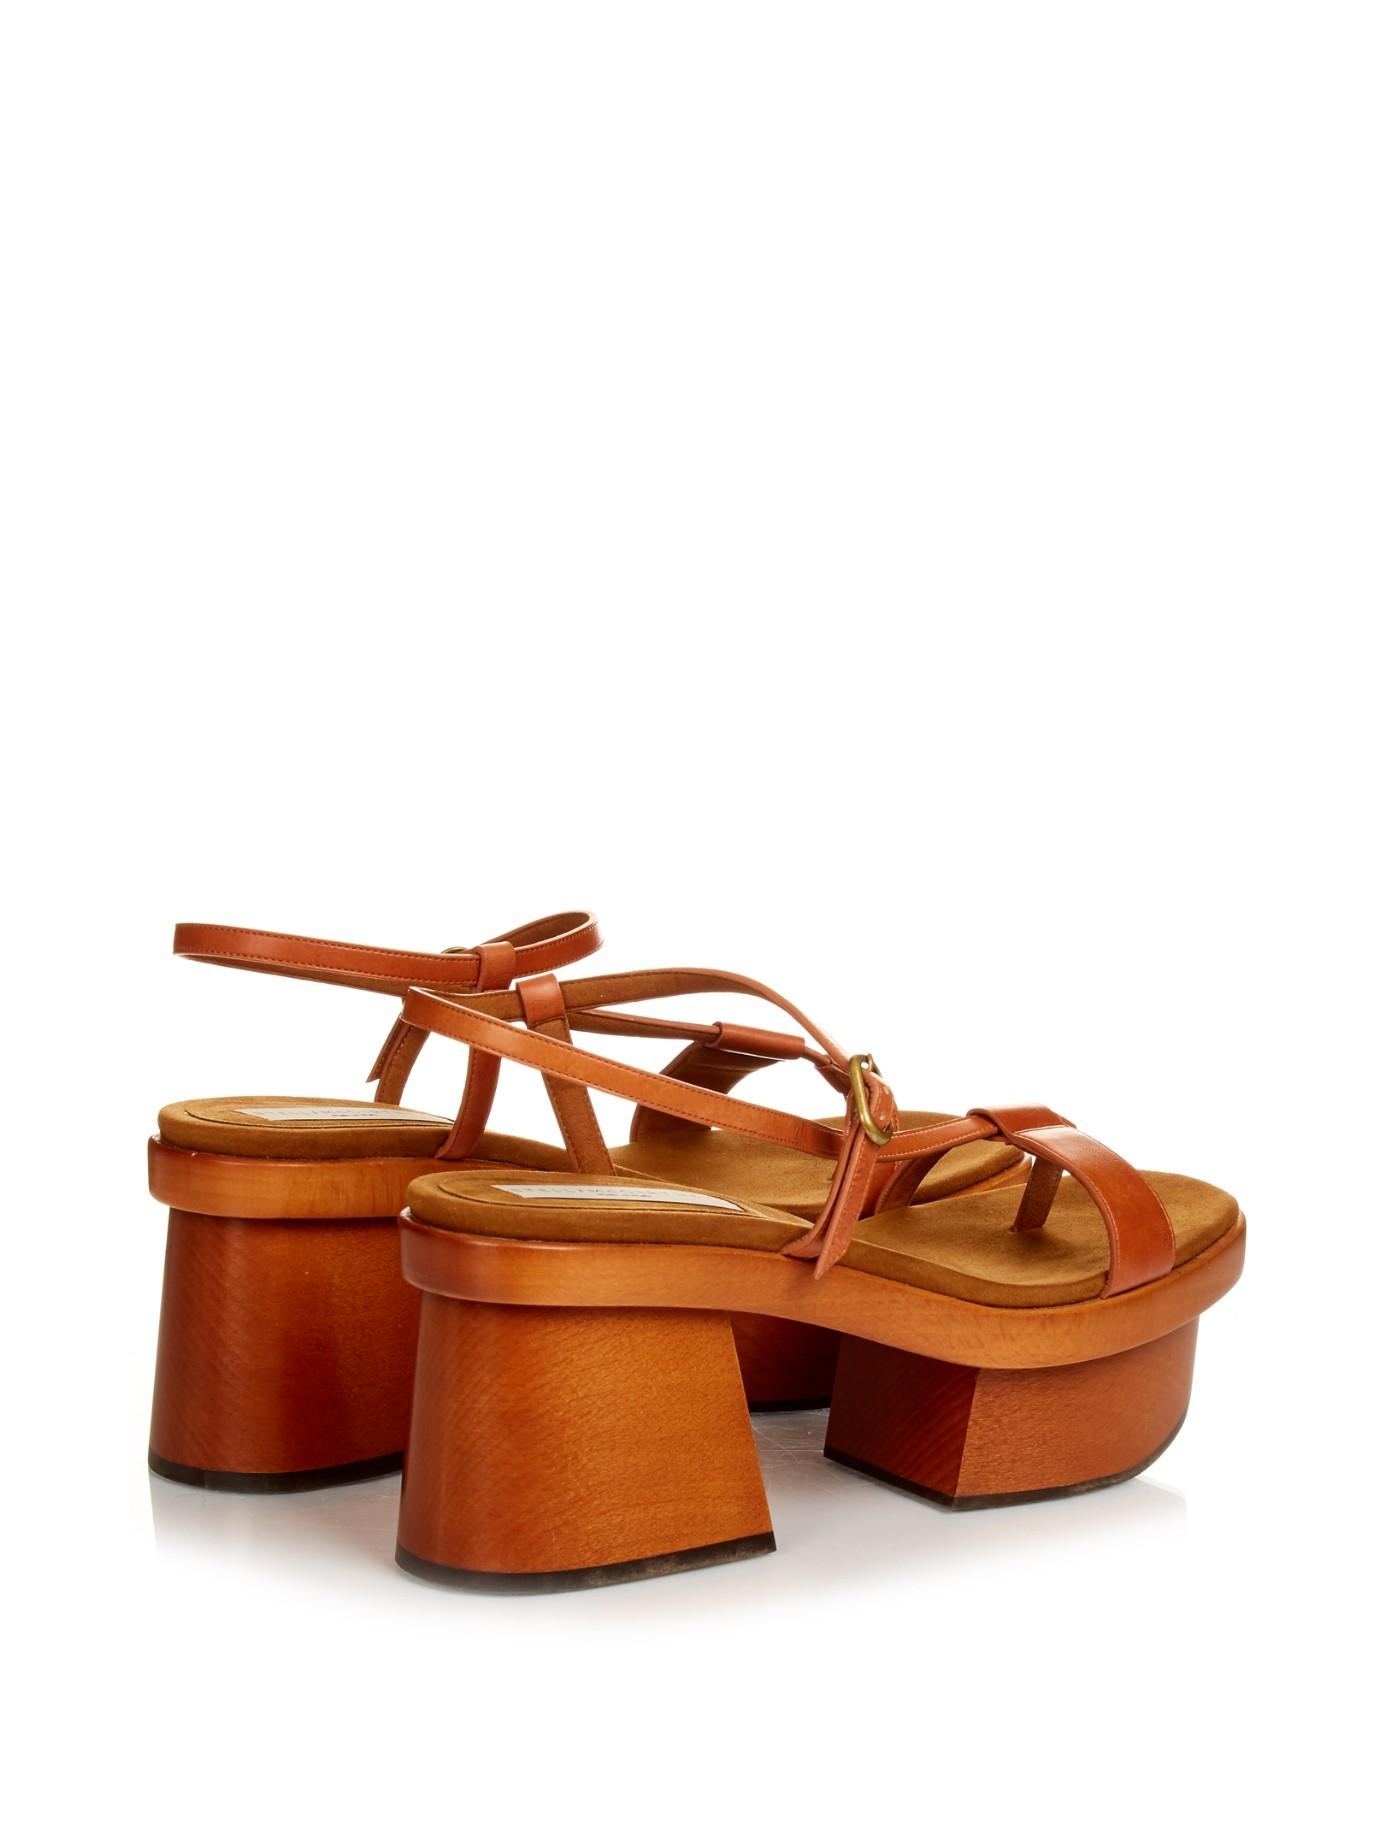 Stella mccartney Altea Faux-leather Block-heel Platform ...